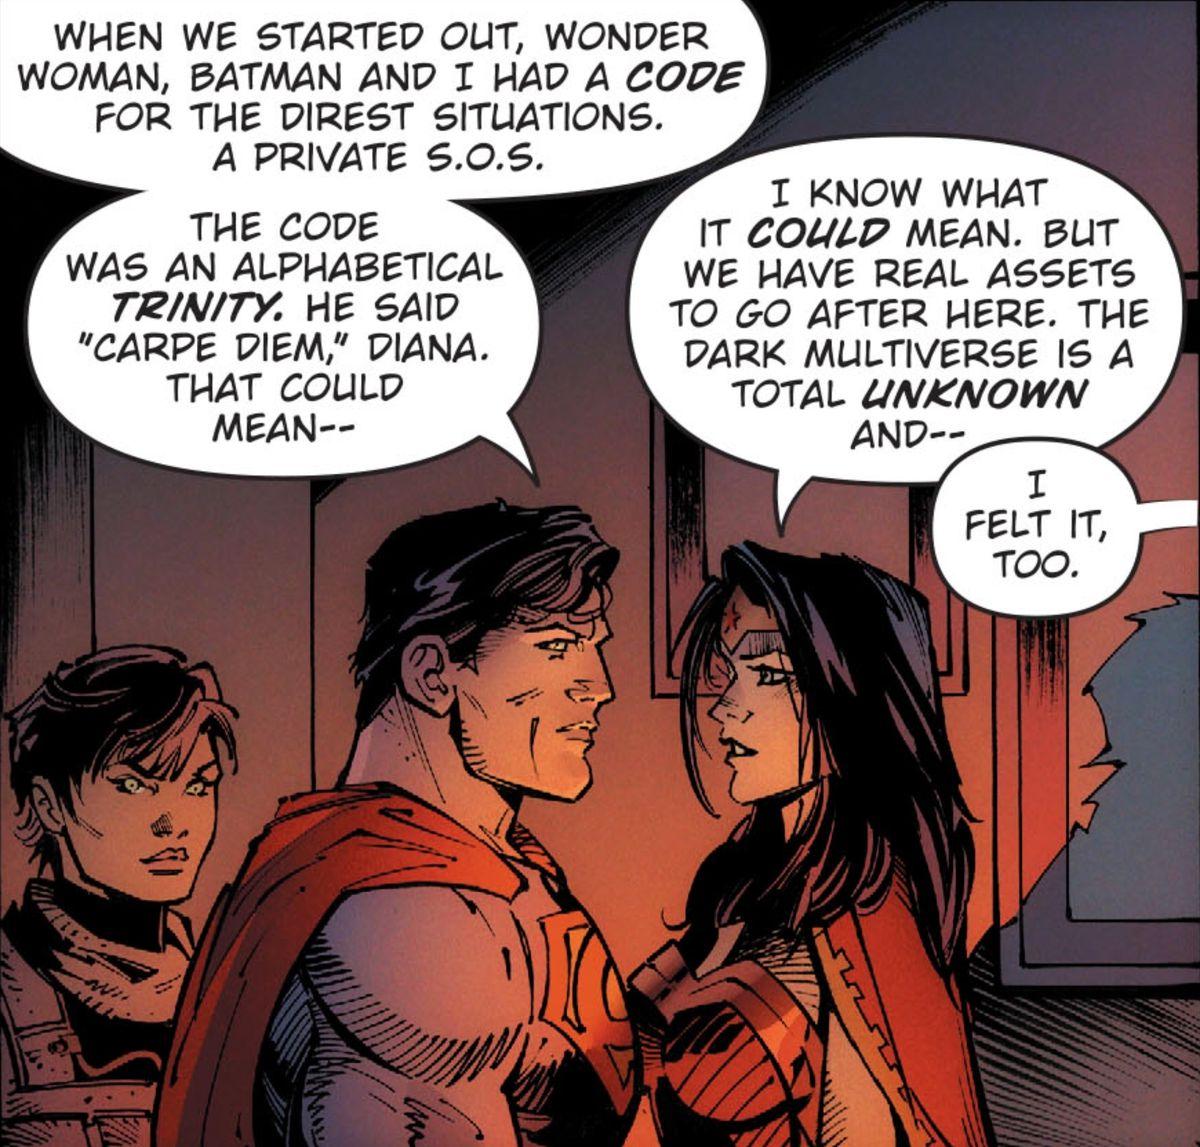 From Batman: Metal #3, DC Comics (2017), part of the Dark Nights: Metal crossover